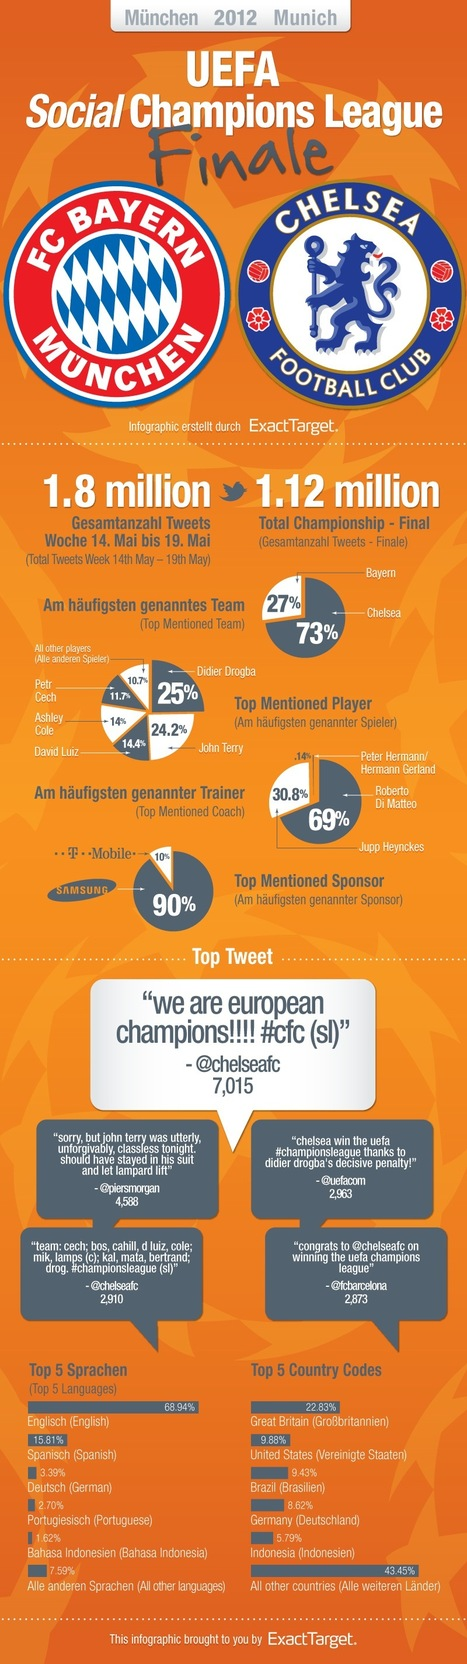 Chelsea Dominated Champions League Final on Twitter [INFOGRAPHIC] | ten Hagen on Social Media | Scoop.it